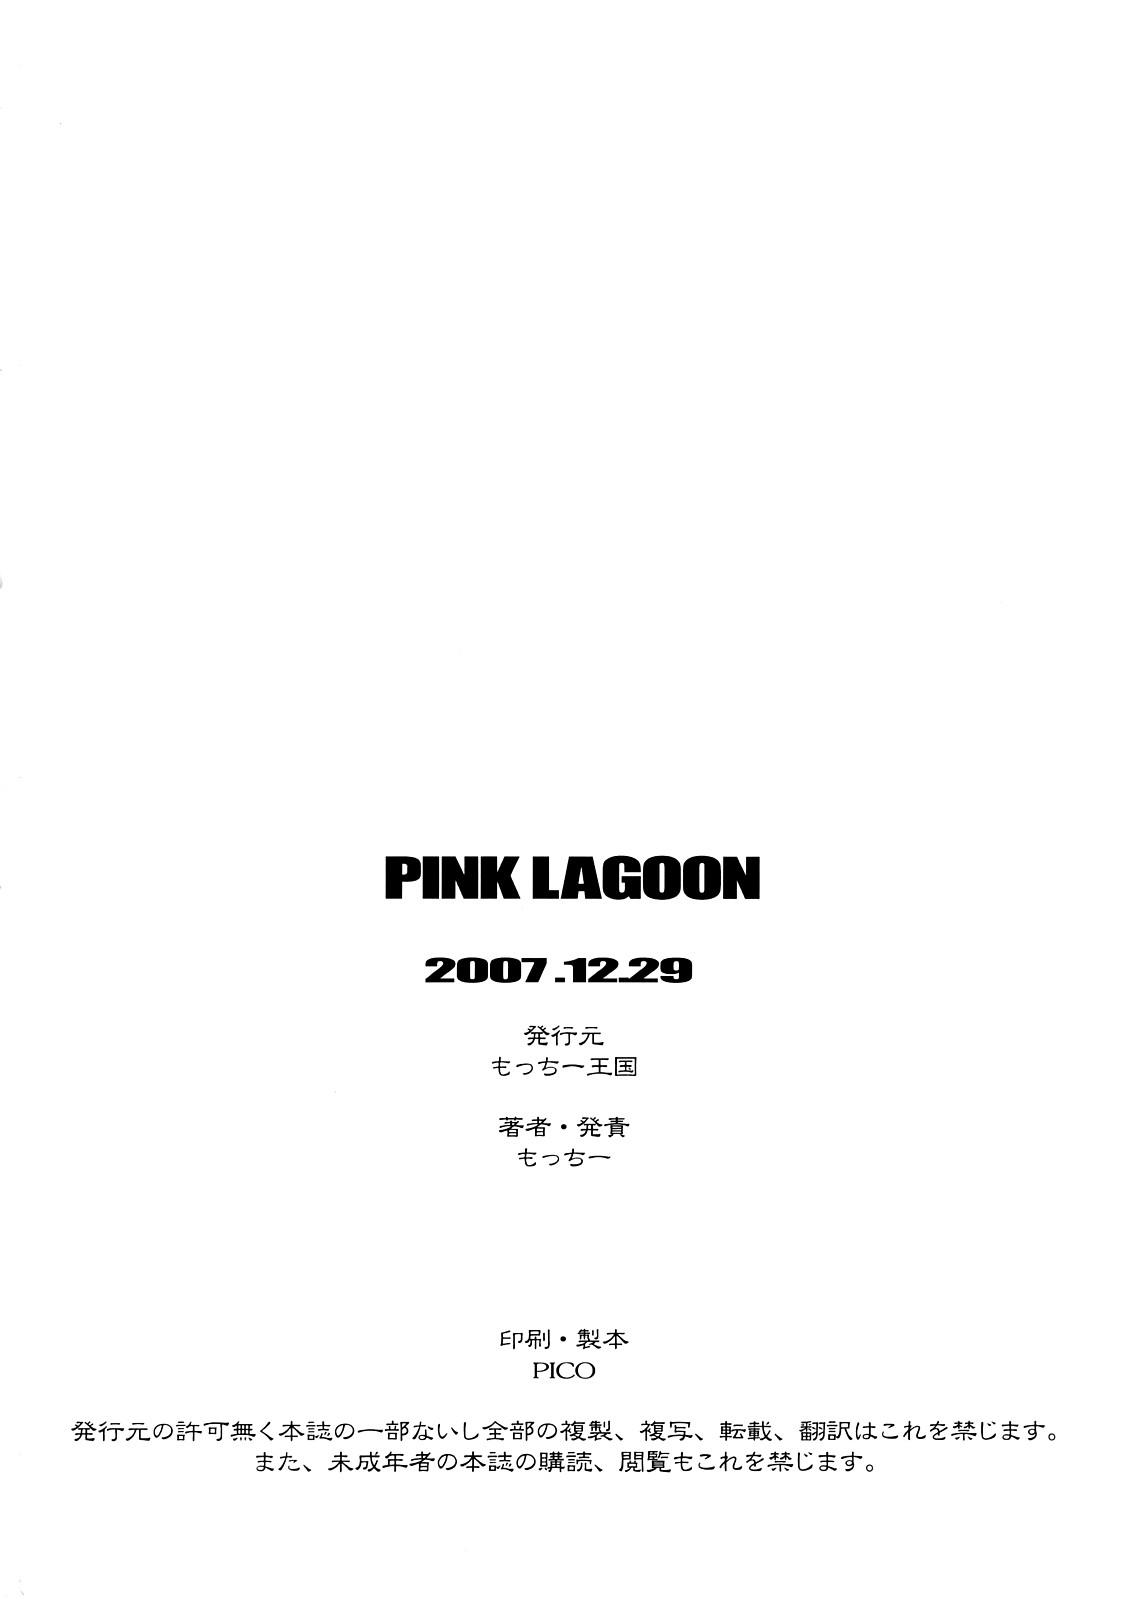 PINK LAGOON 003 24